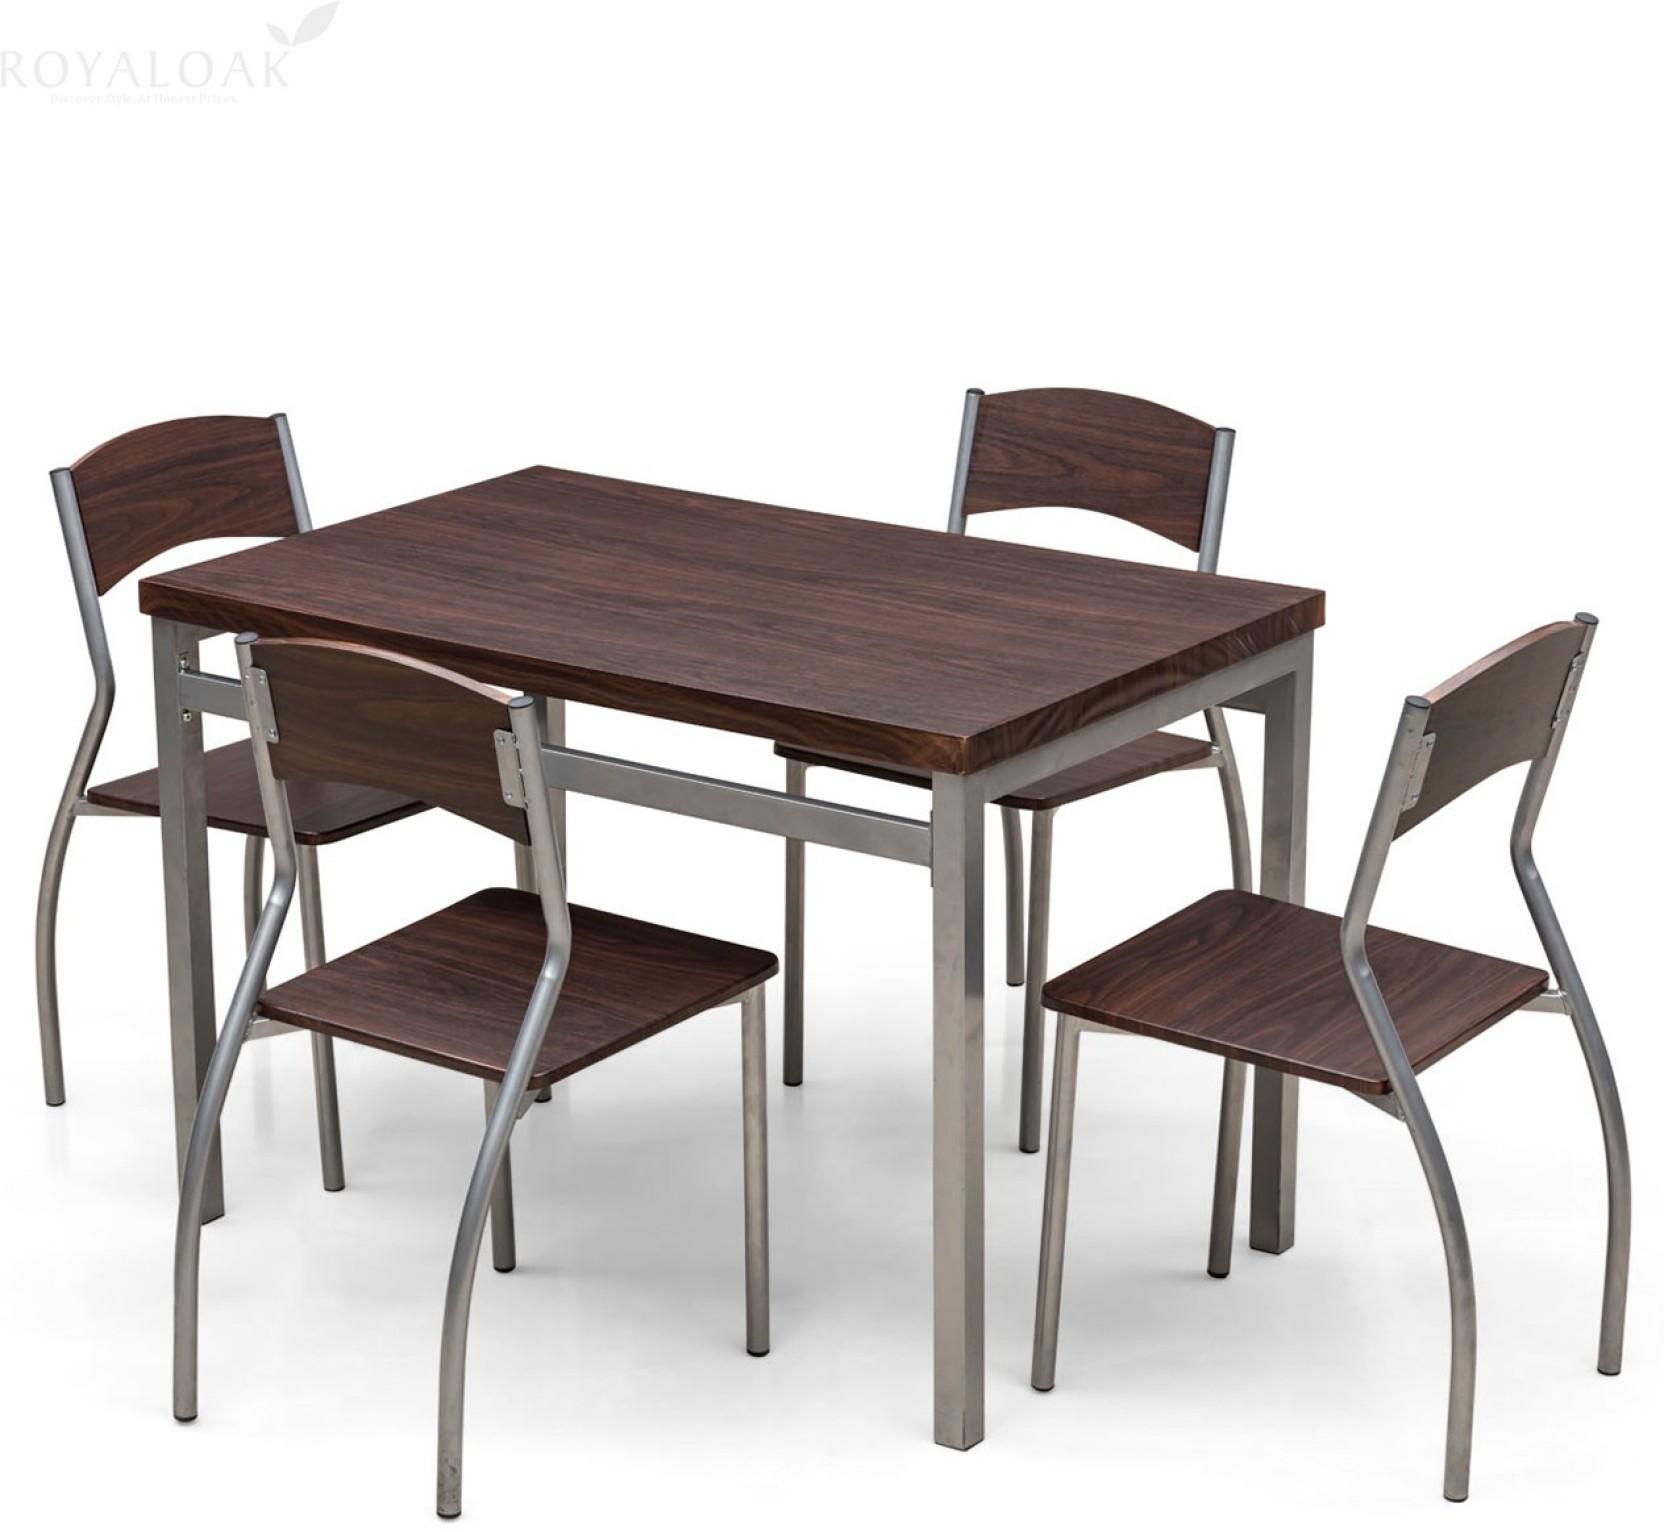 RoyalOak ZITA Engineered Wood 4 Seater Dining Set Price in  : 4 seater na mdf dt71nt 4 royaloak honey brown original imaex8aj7tqqhdte from www.flipkart.com size 1664 x 1532 jpeg 219kB